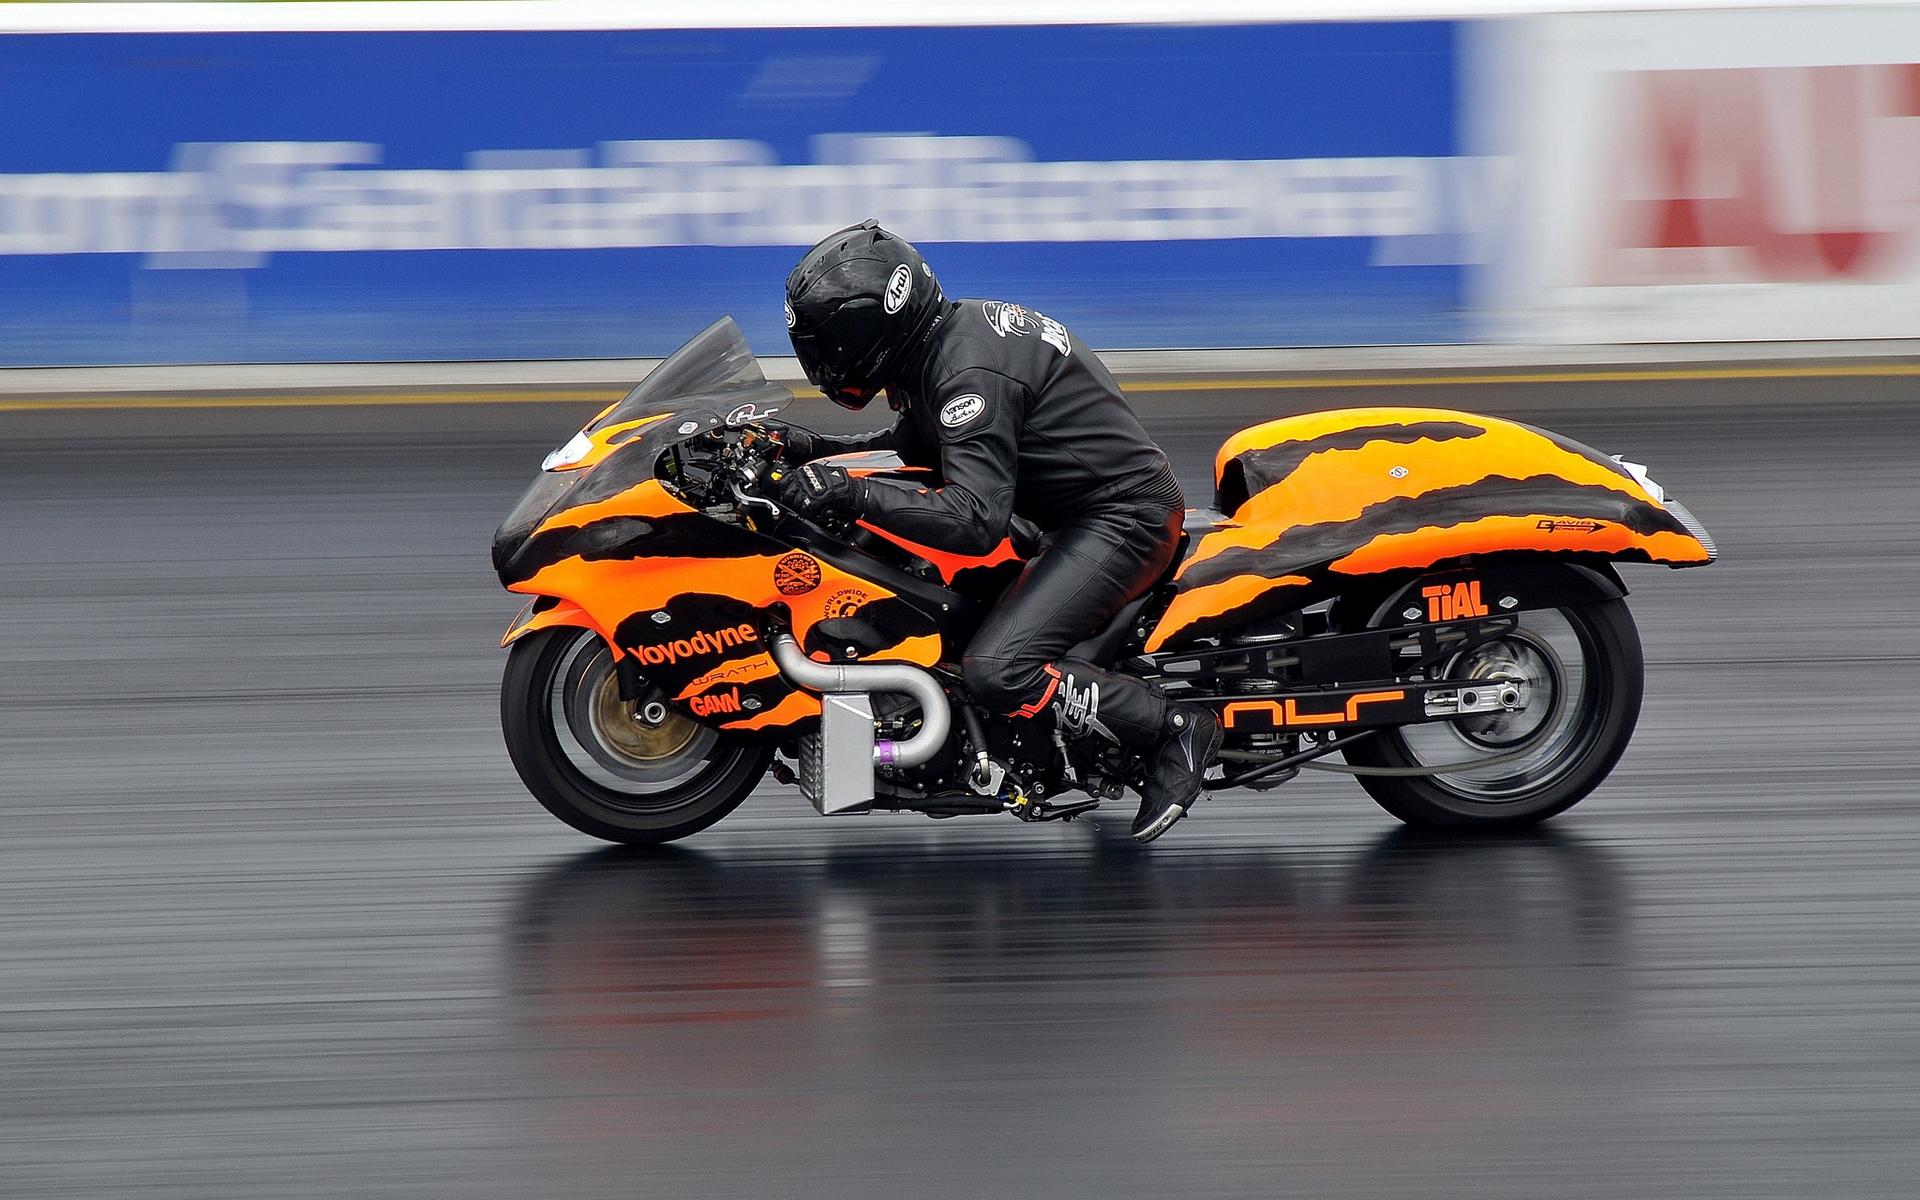 Download wallpaper 1920x1200 motorcycle bike racing sports 1920x1200